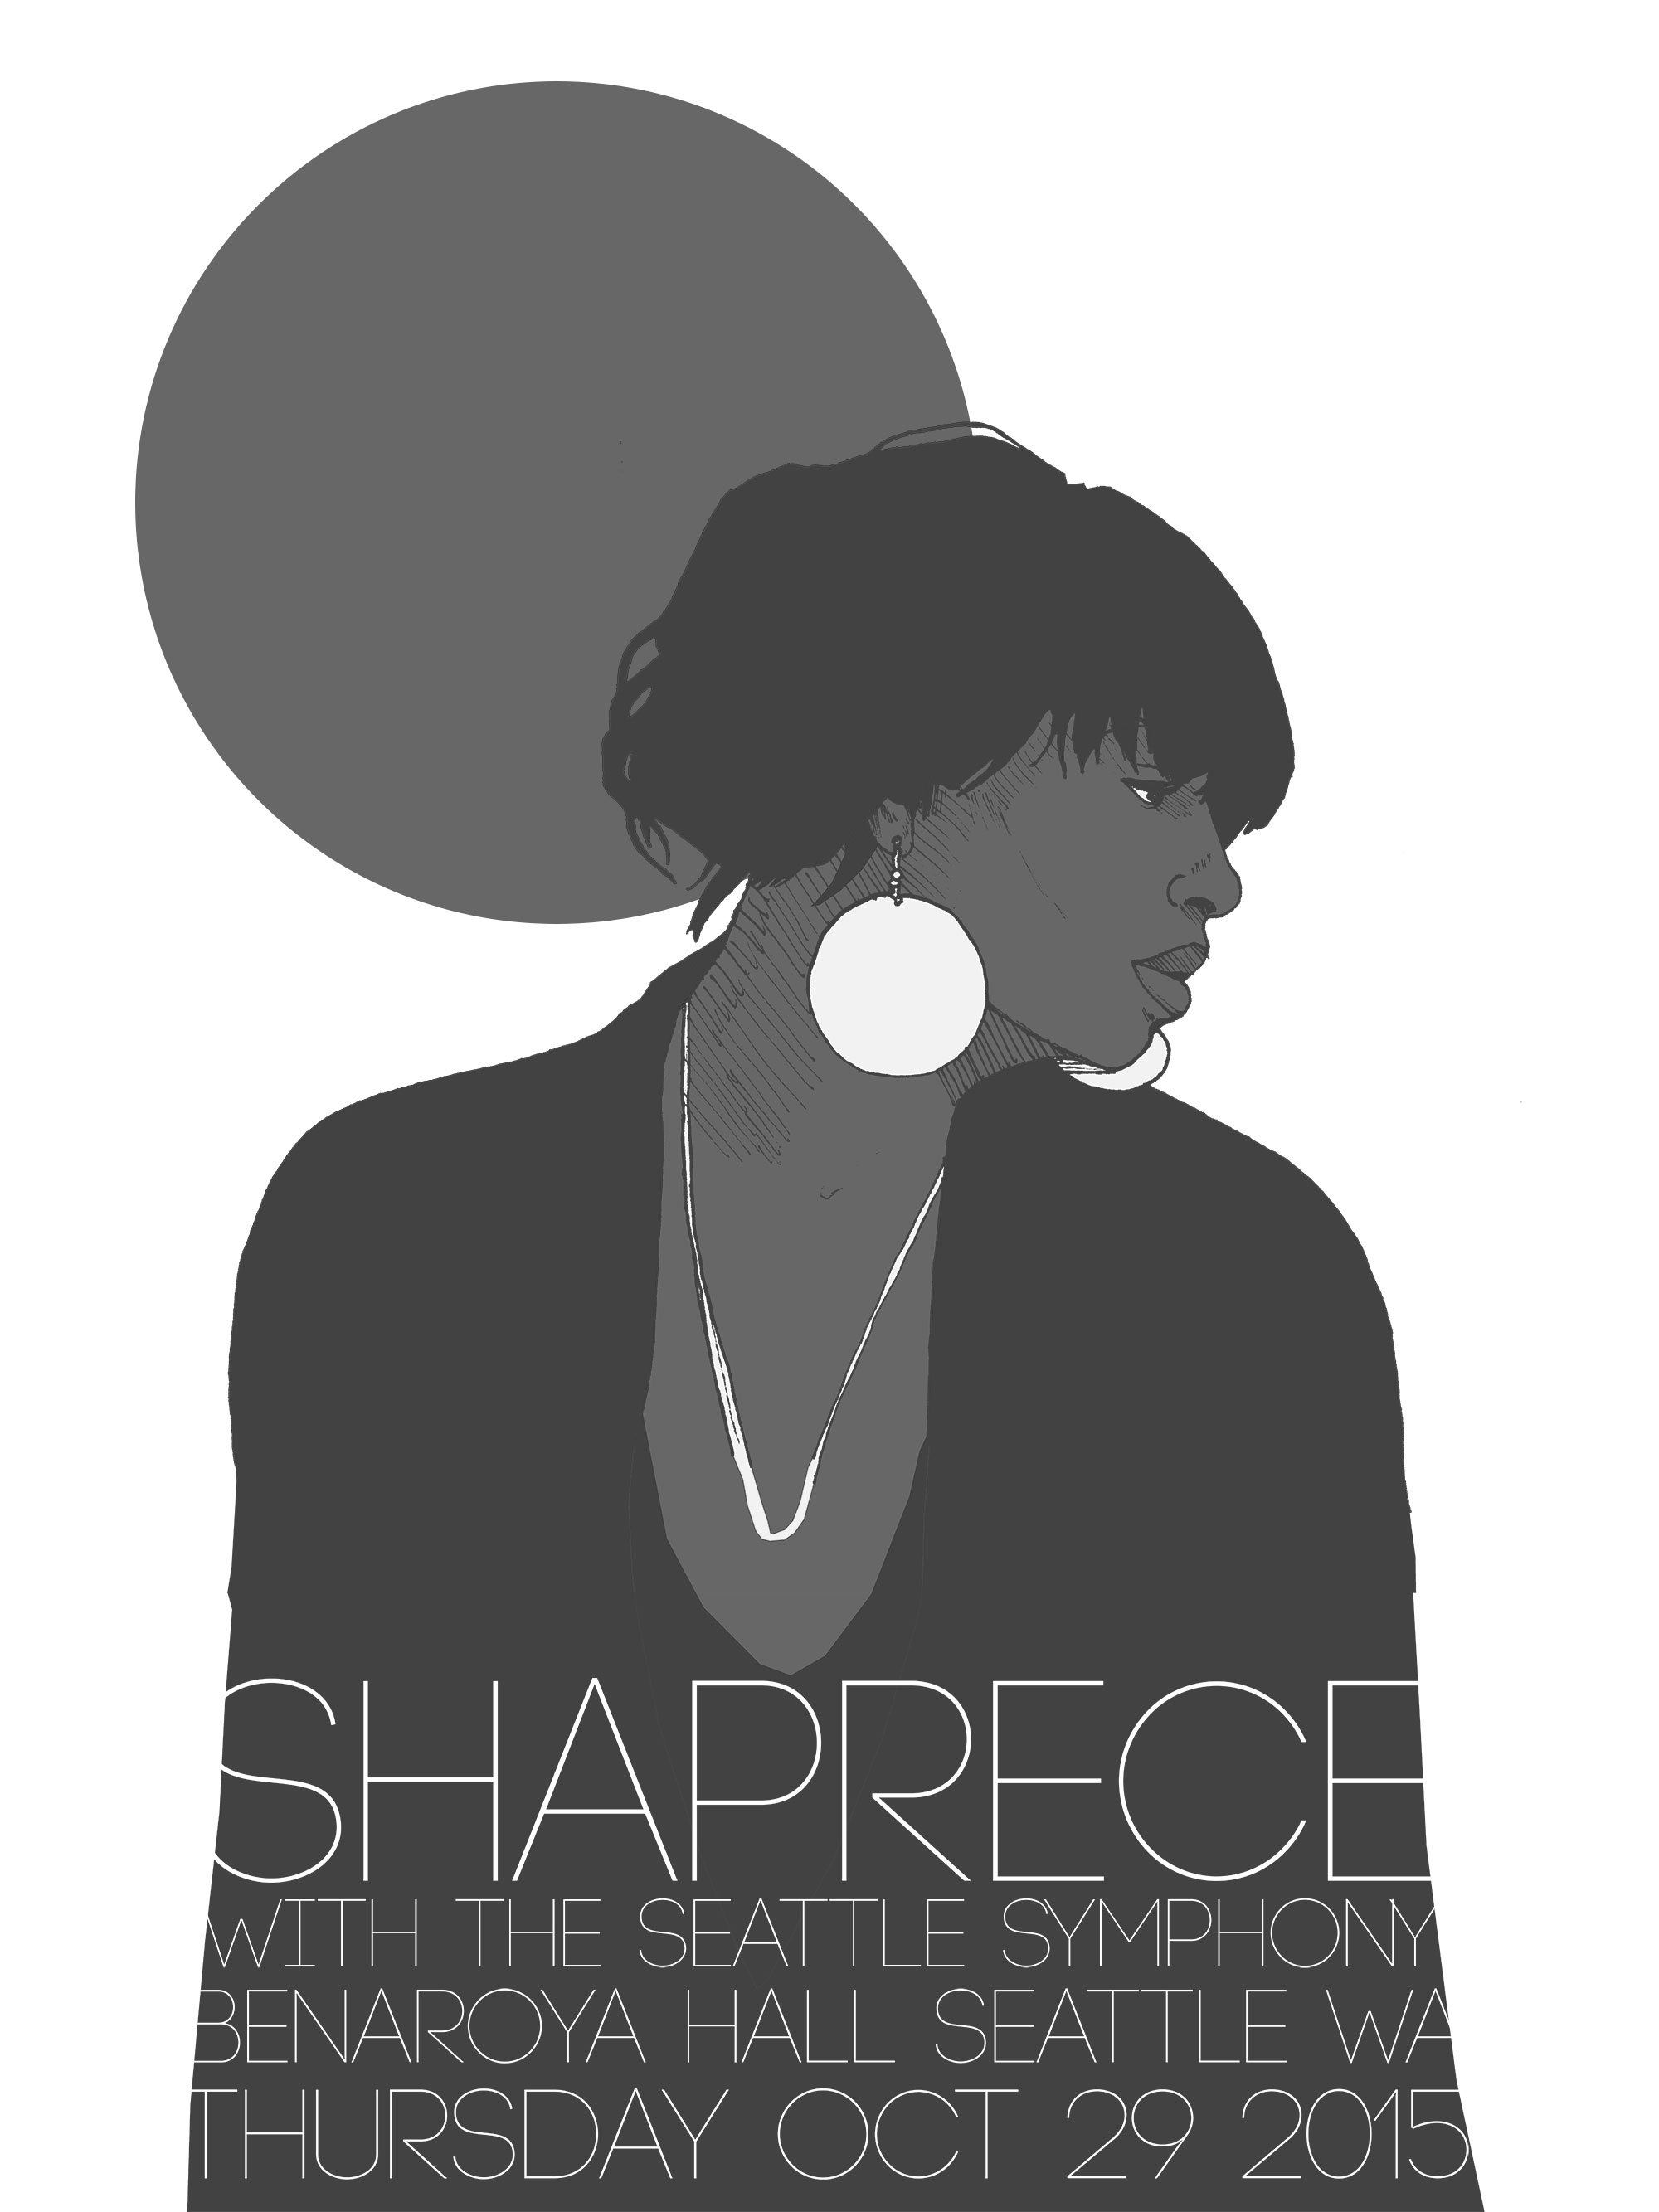 Shaprece-Poster-2.2-WEB.jpg